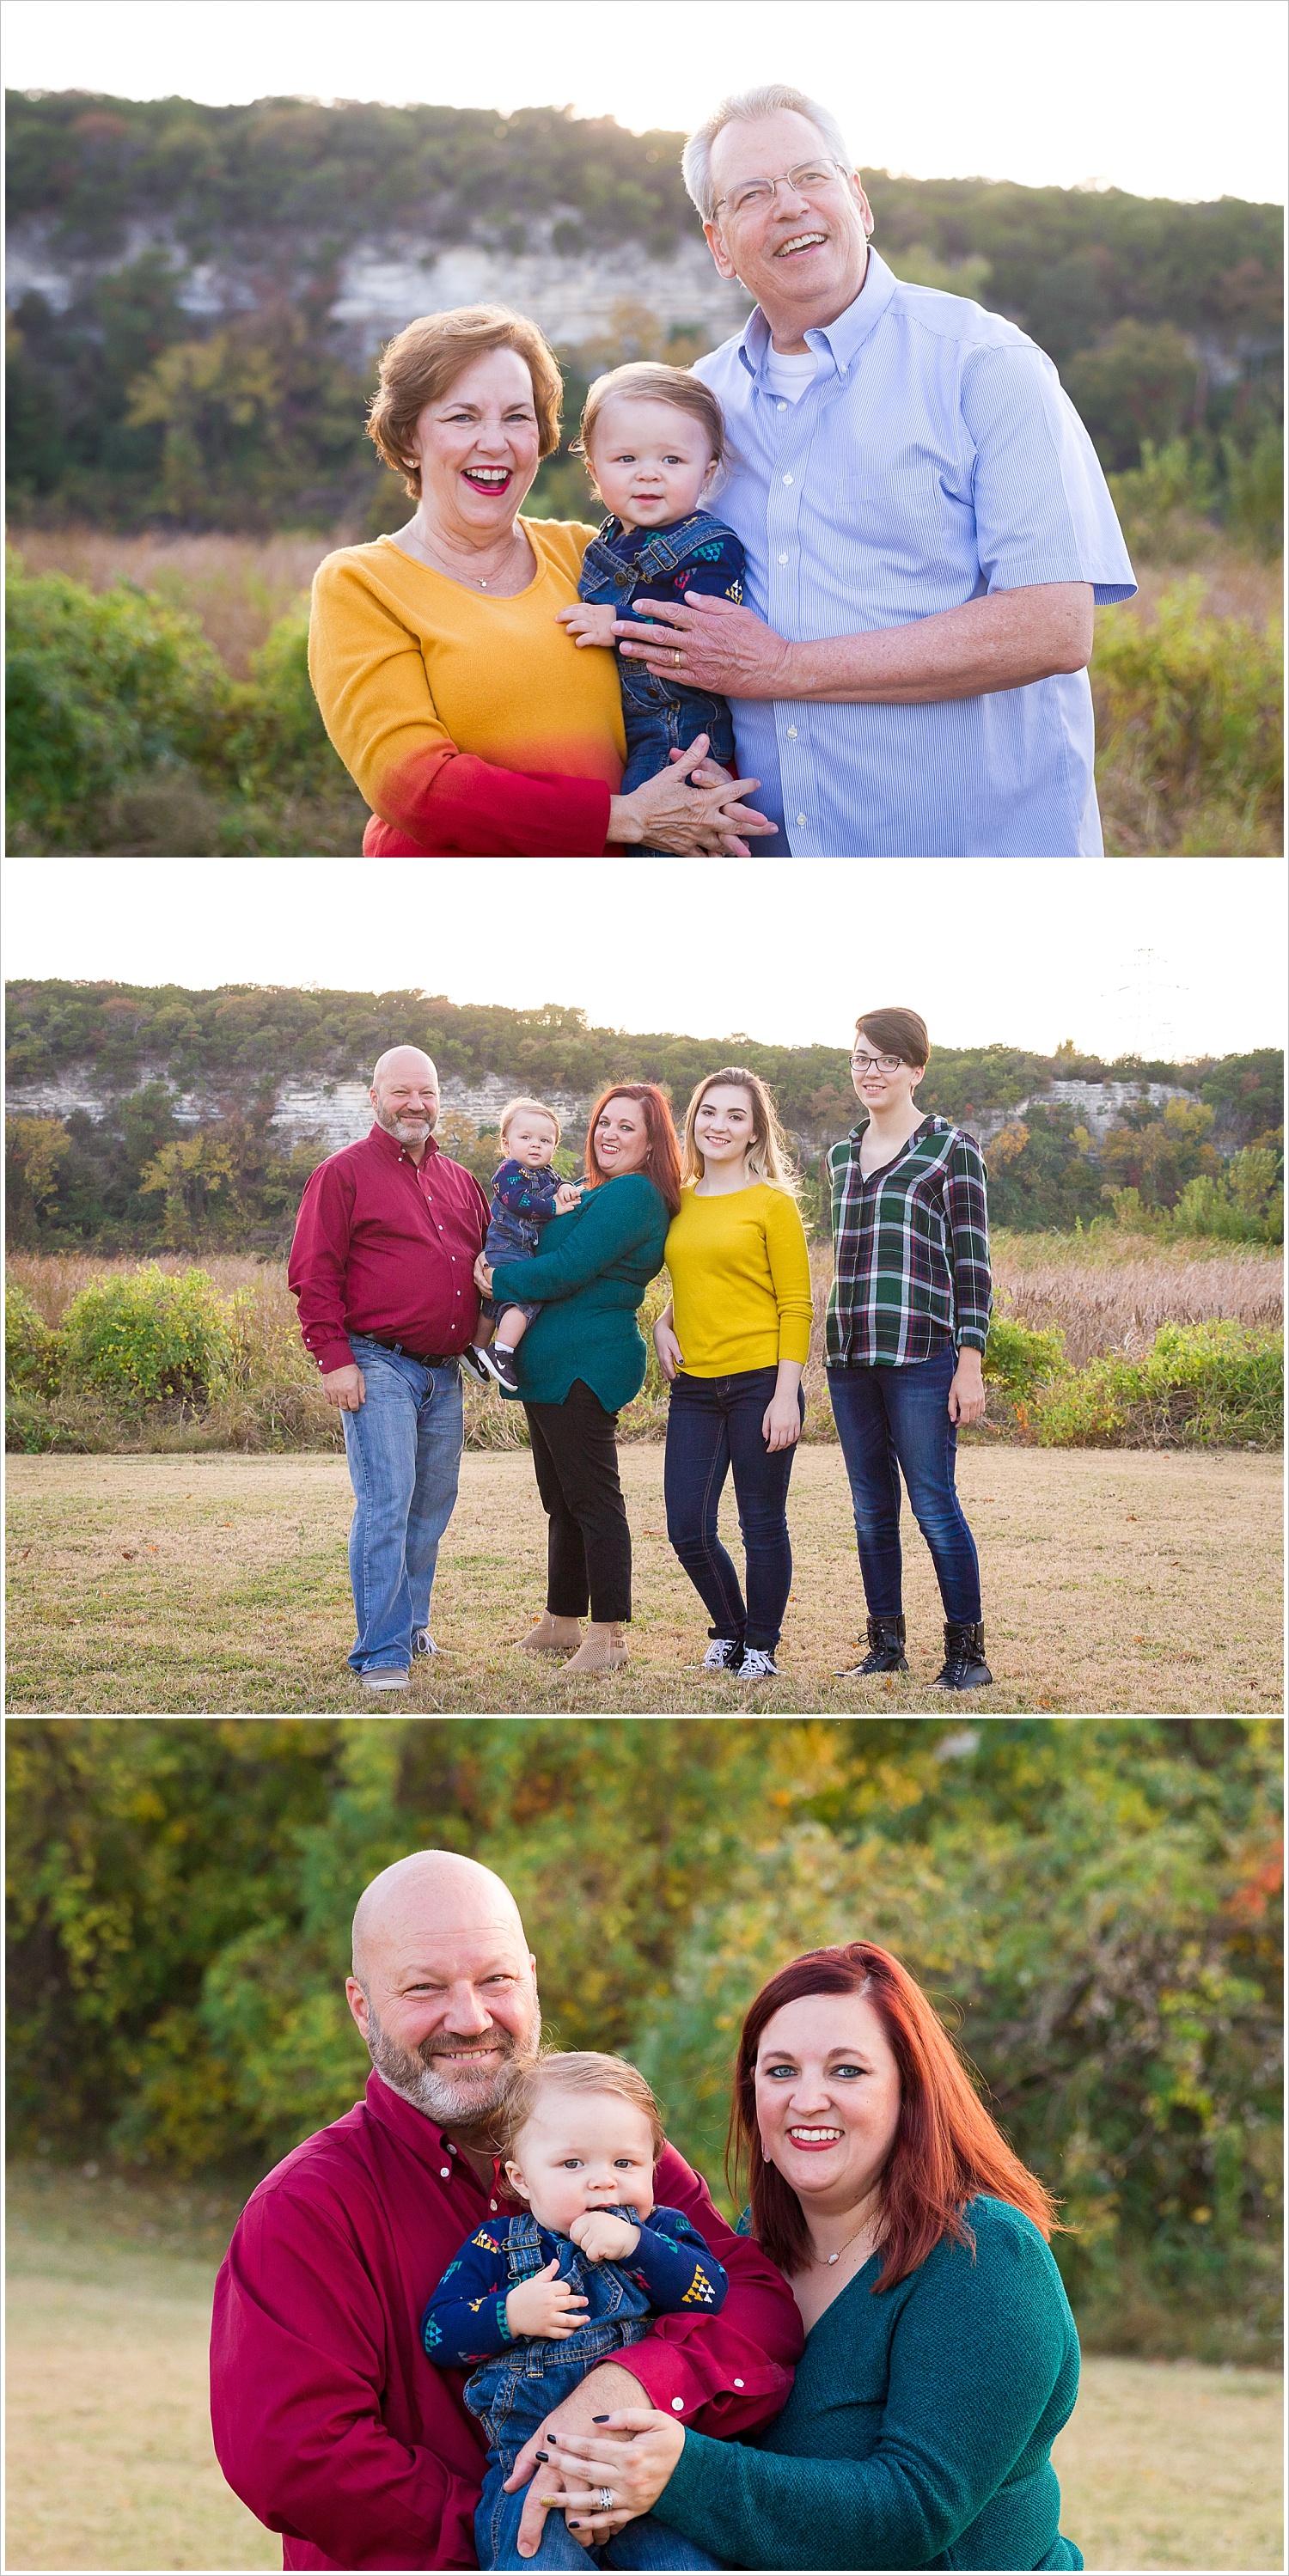 3 generations of a family pose together in the fall colors of Waco, Texas - Jason & Melaina Photography - www.jasonandmelaina.com